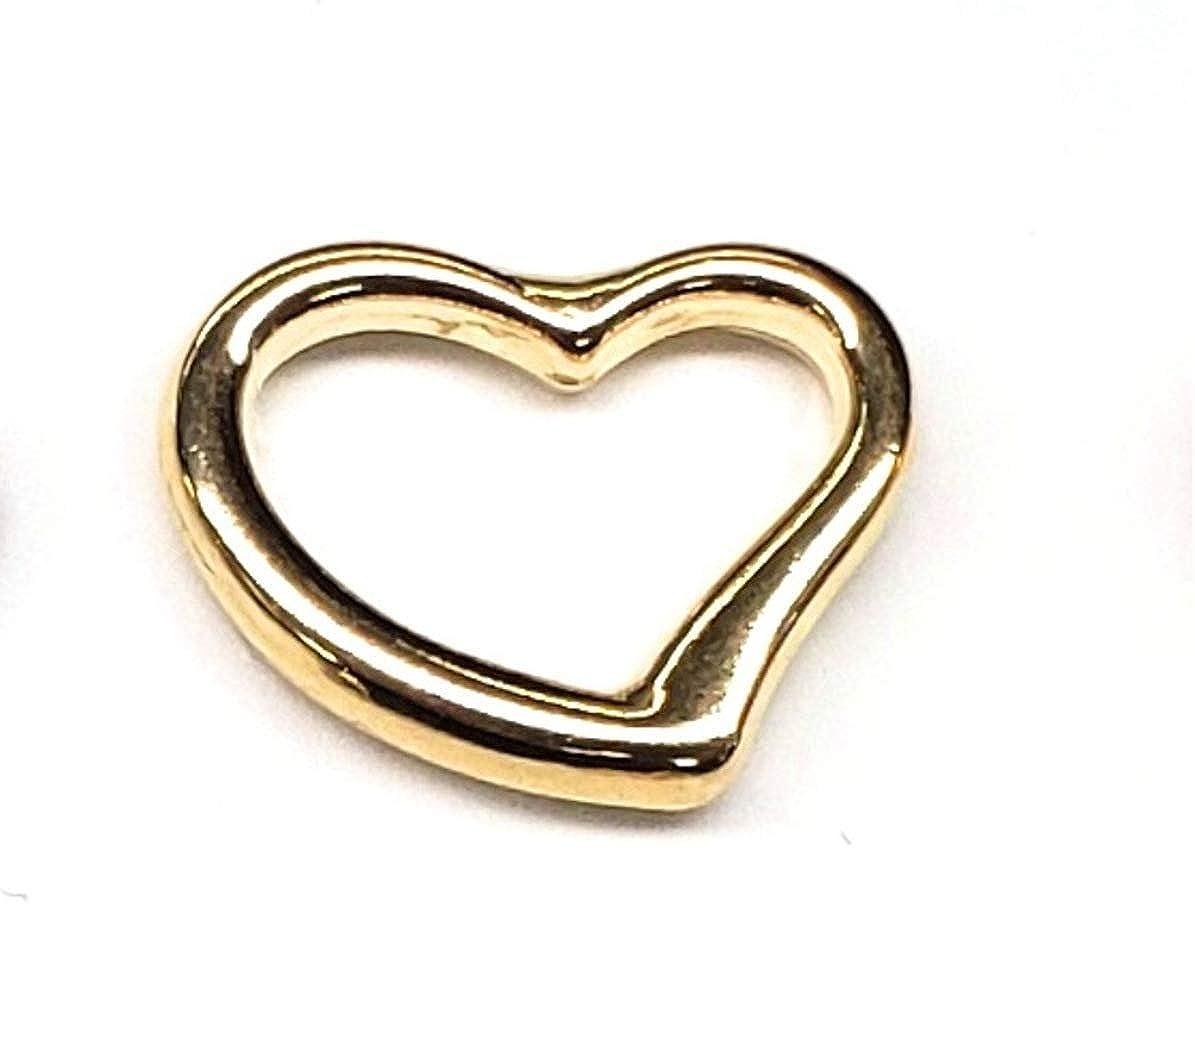 YHILLEL 14K Solid Gold Medium Open Heart Pendant Charm